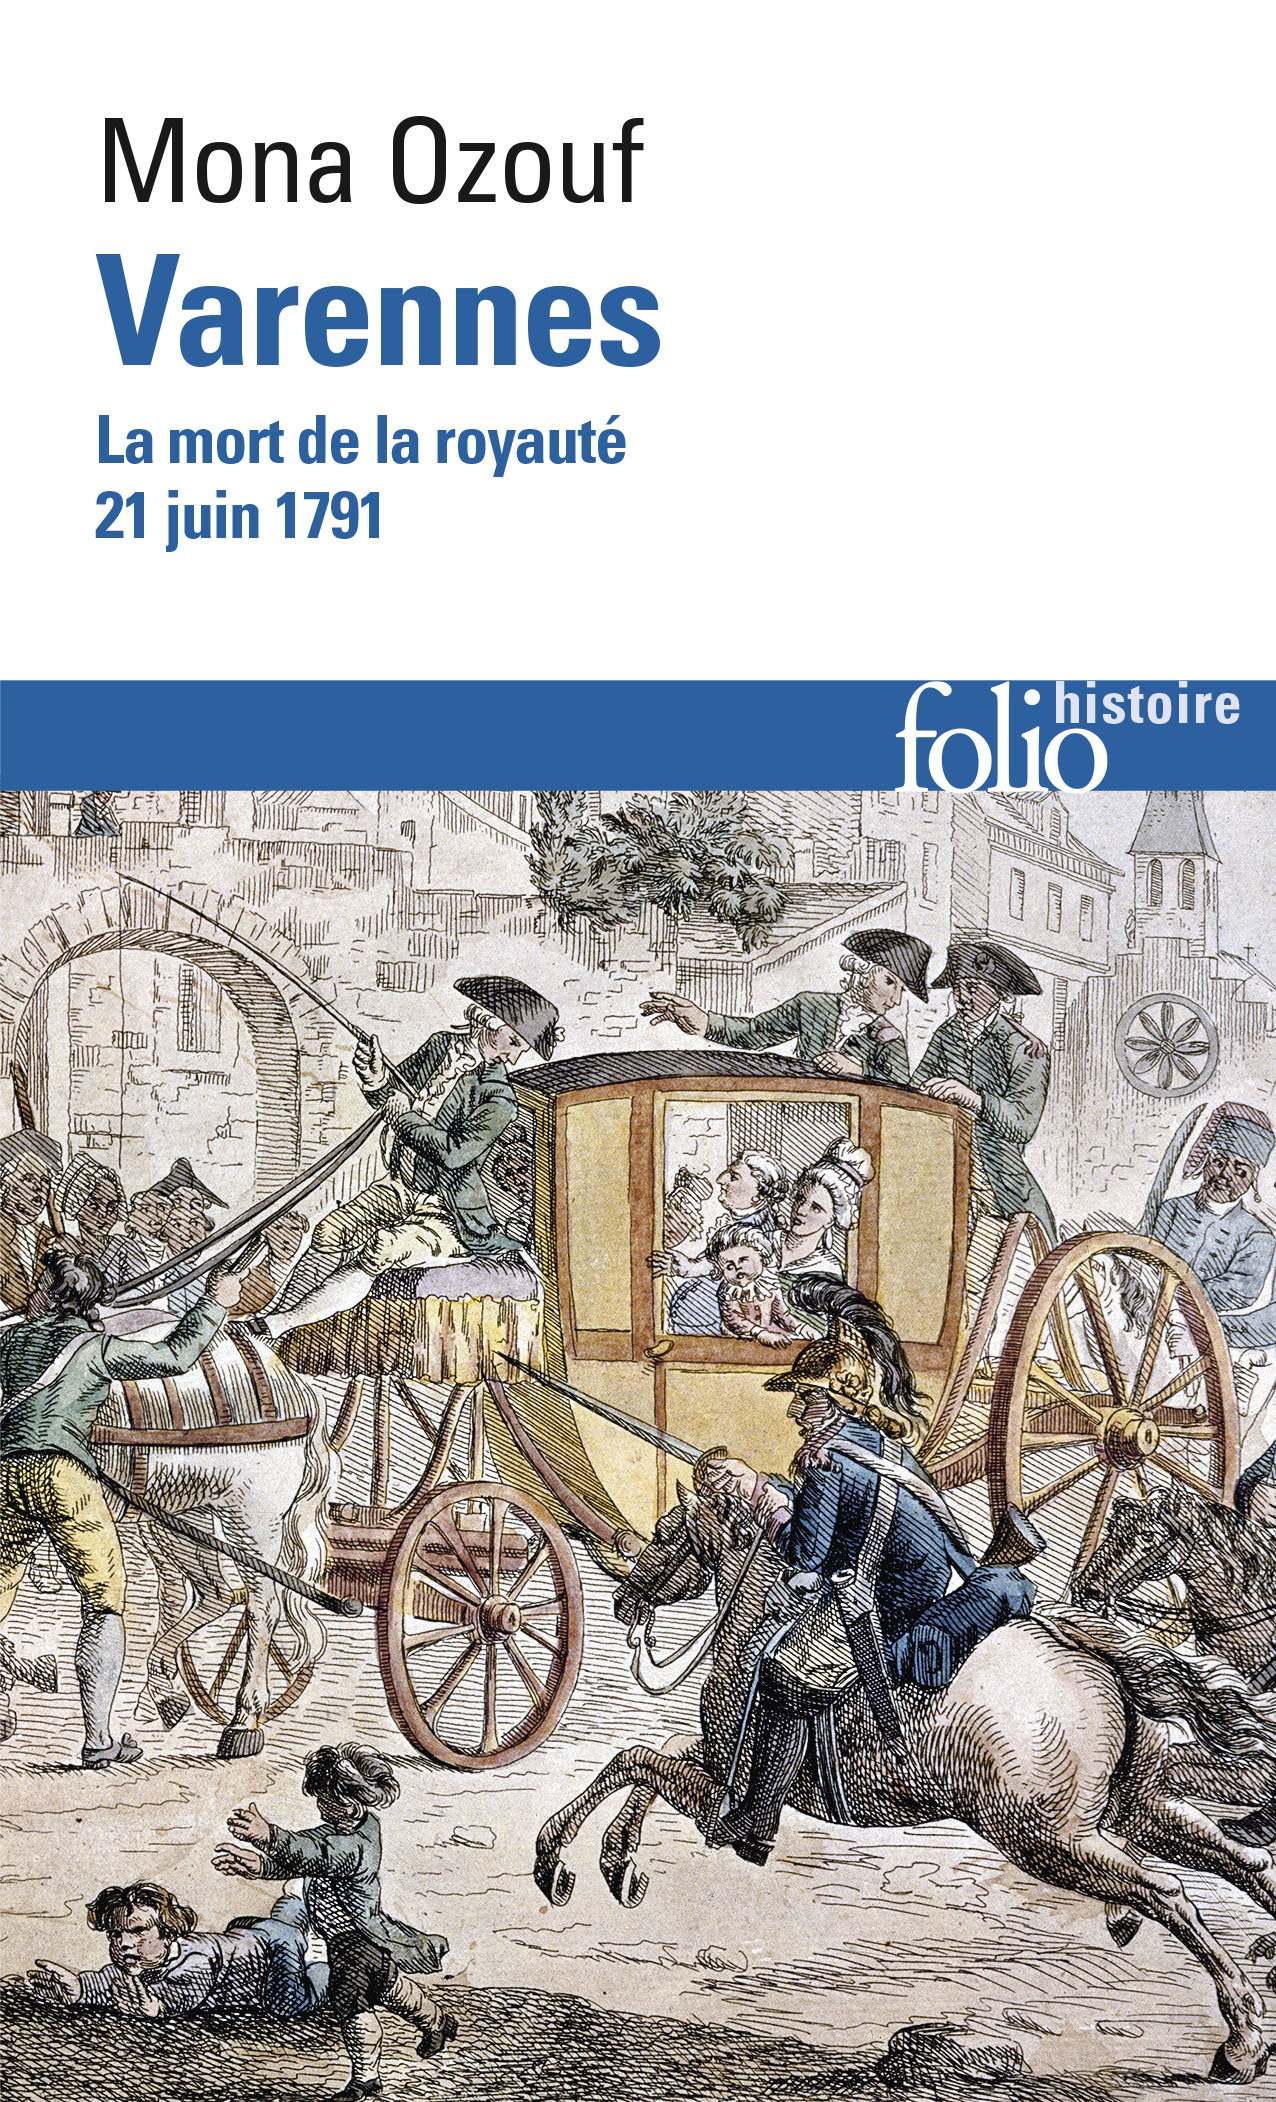 VARENNES LA MORT DE LA ROYAUTE, 21 JUIN 1791